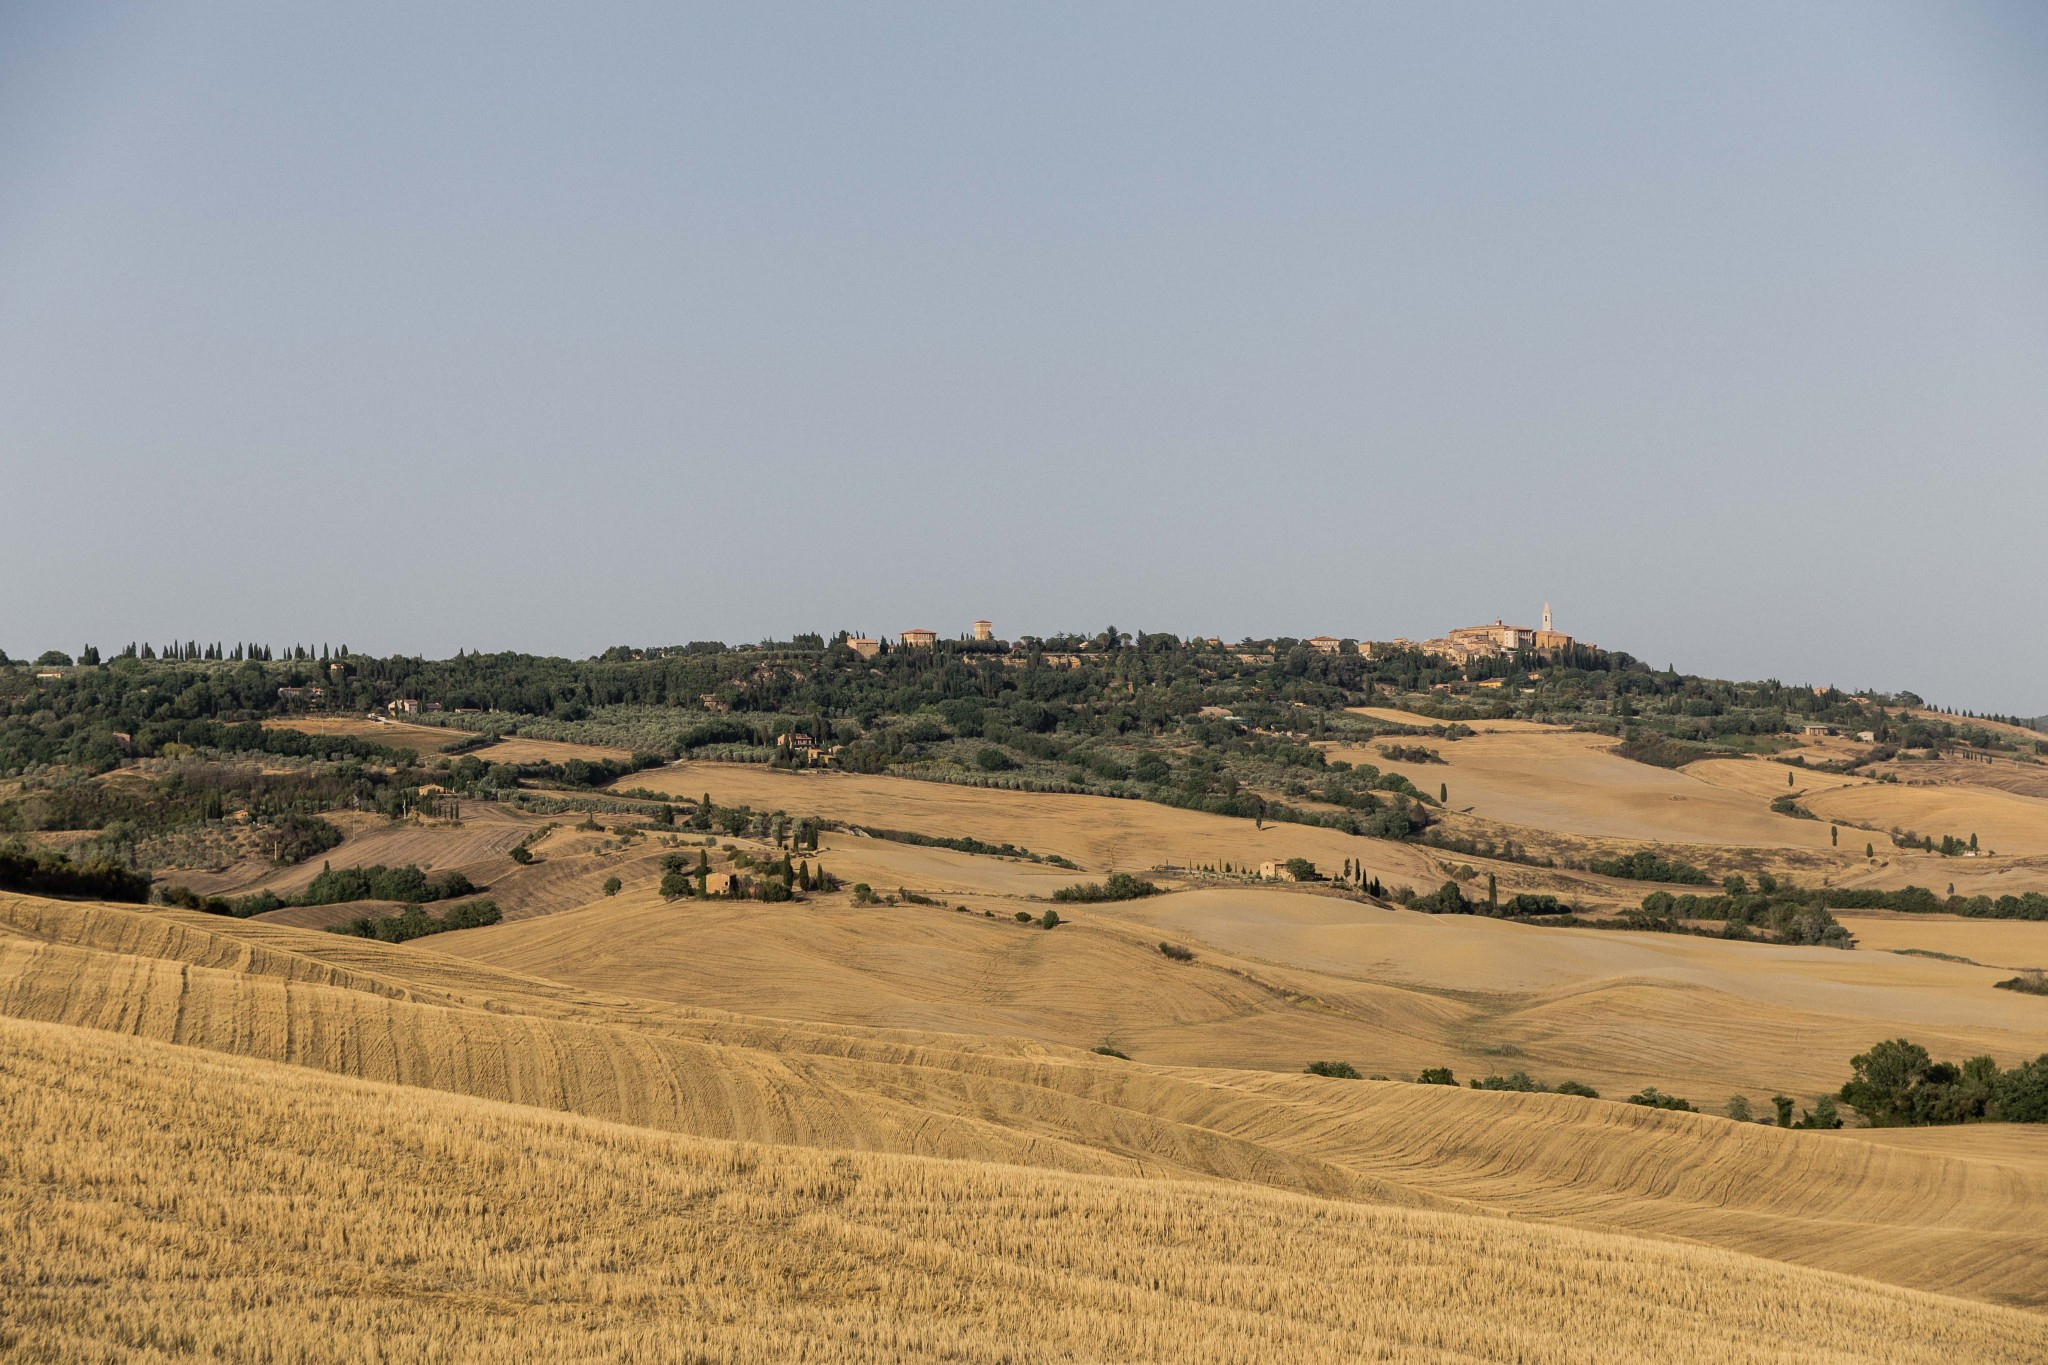 tuscany2 (28 of 39)